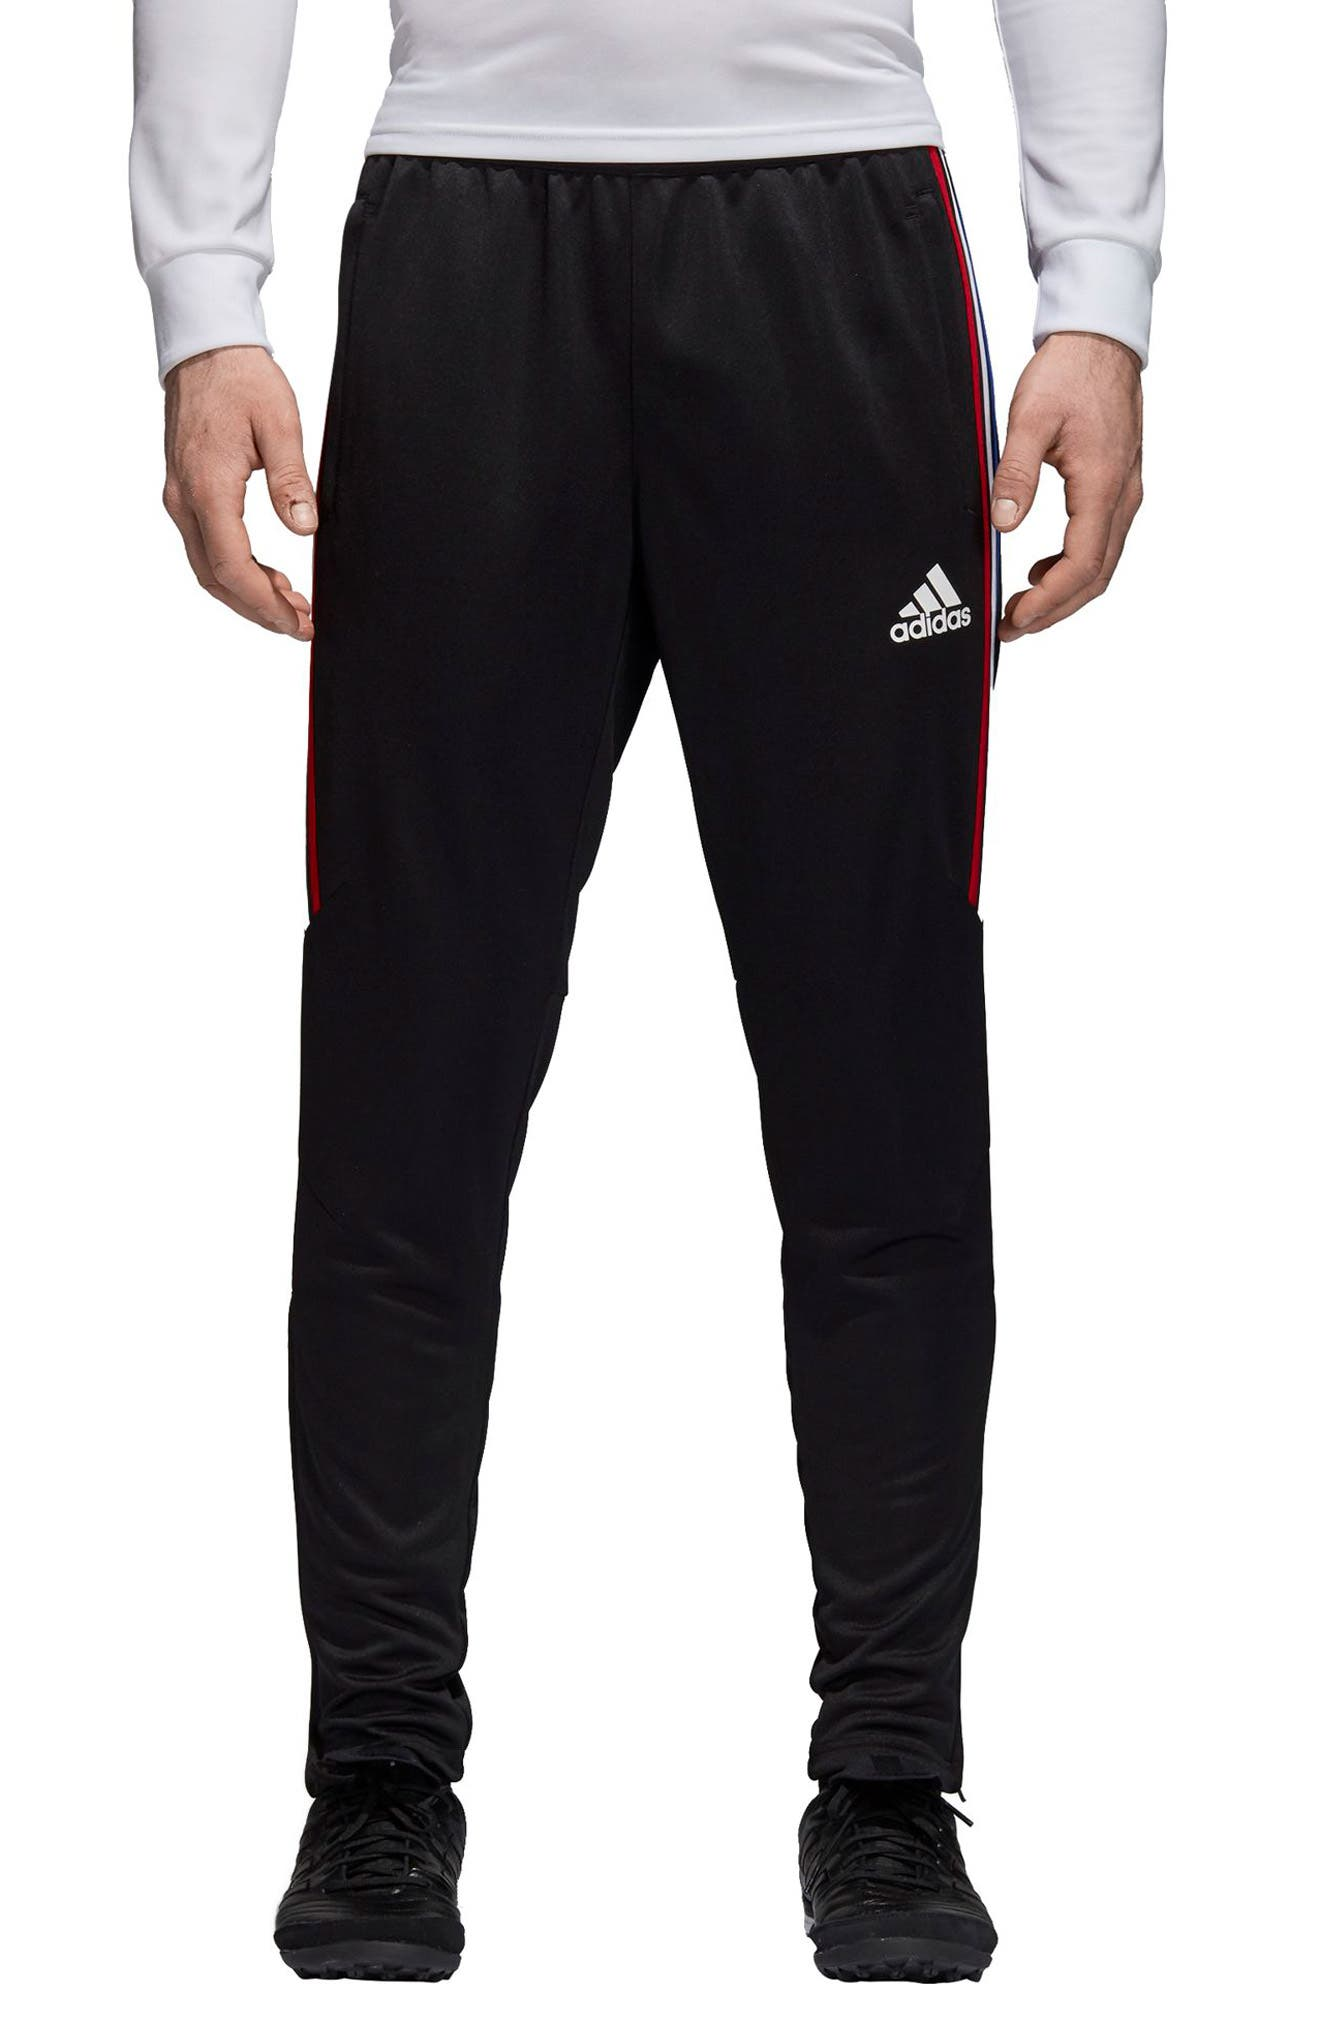 Tiro 17 Regular Fit Training Pants,                         Main,                         color, BLACK/ RED/ WHITE/ BLUE